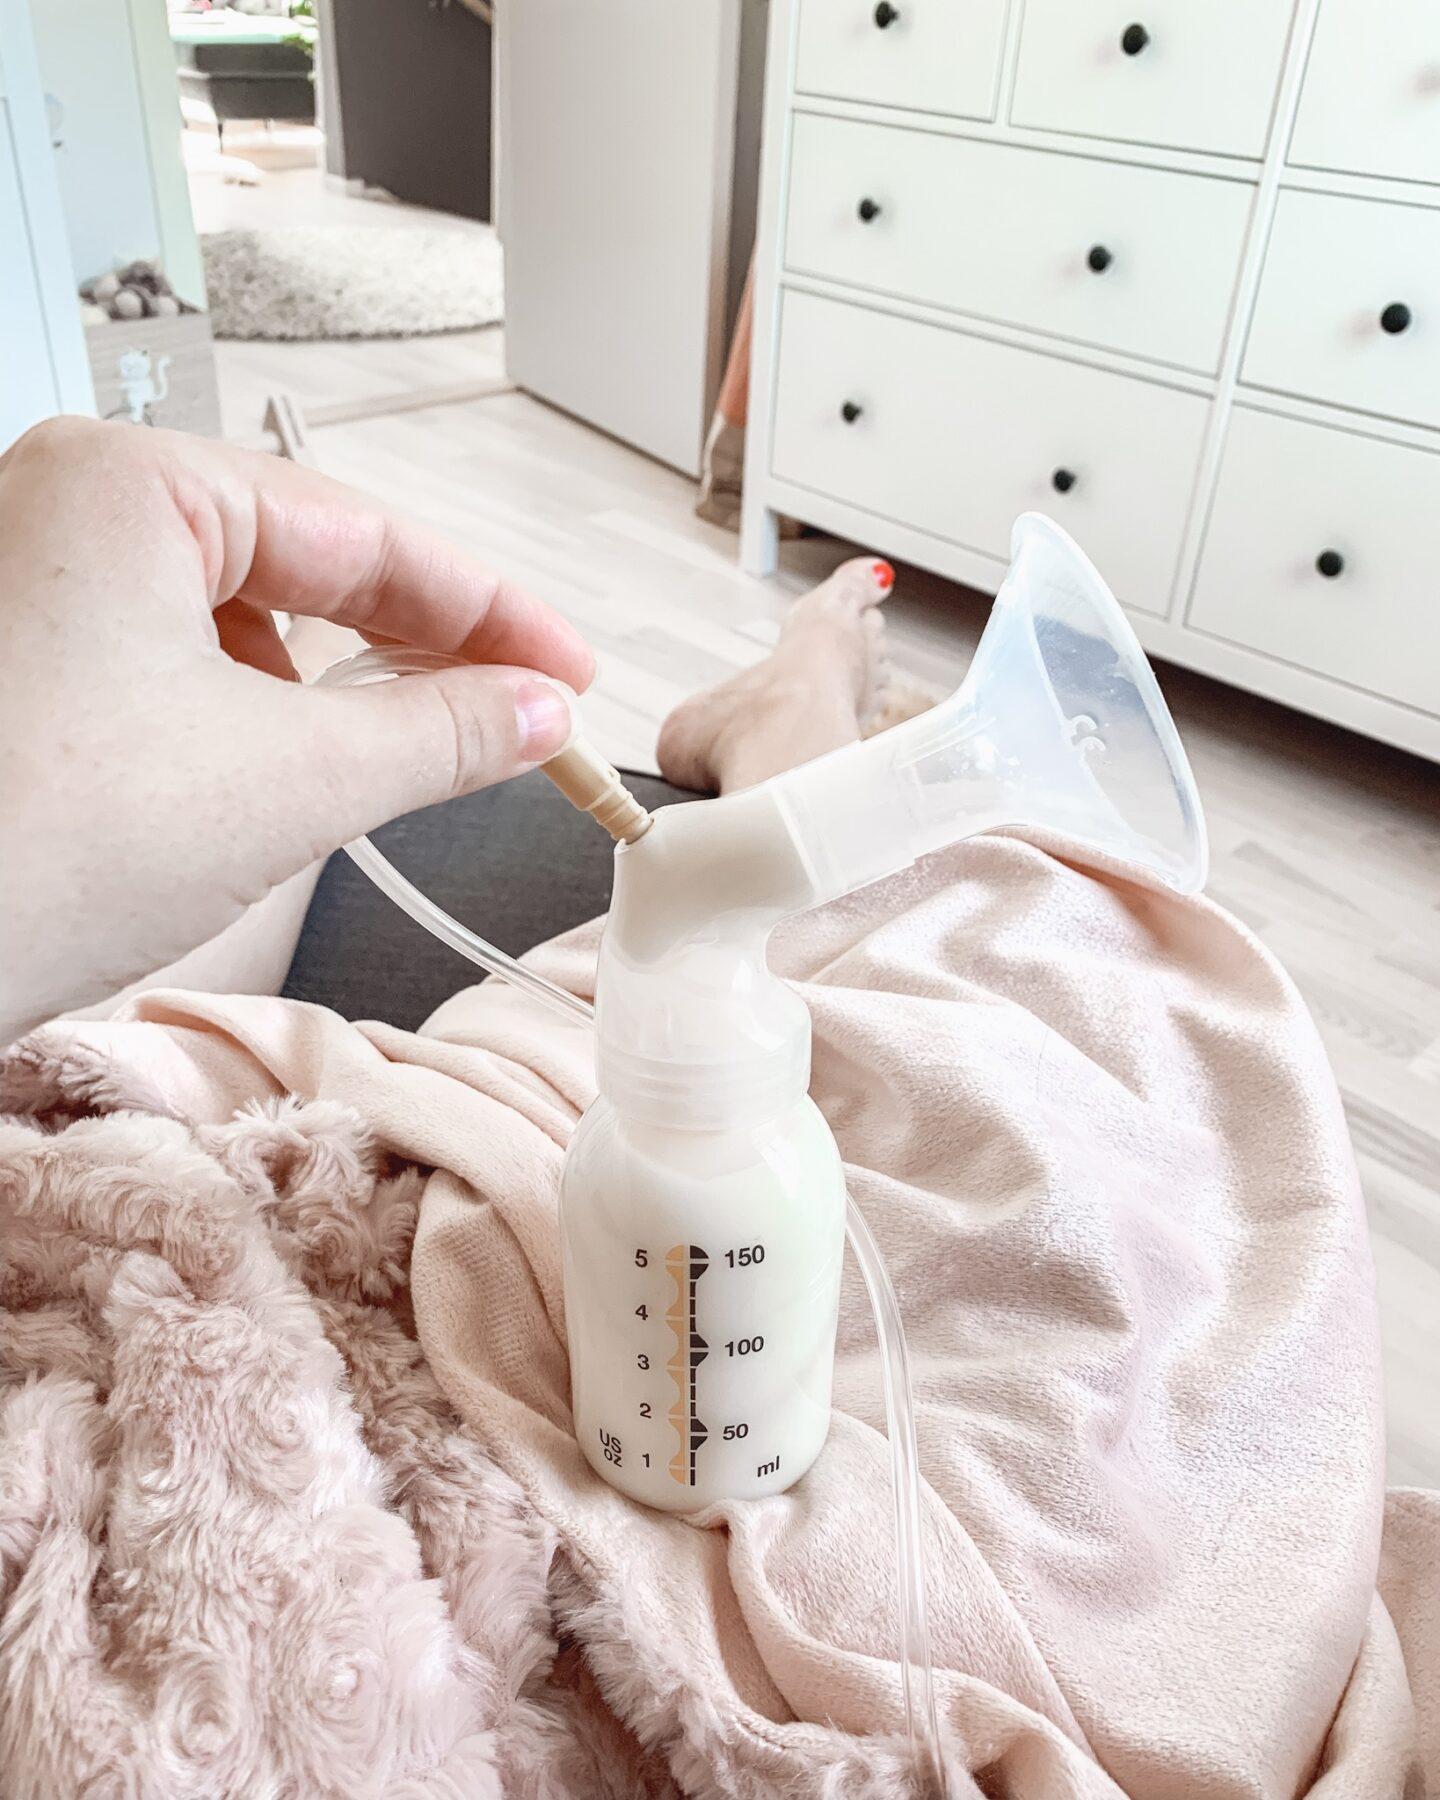 Livet som mjölkmaskin